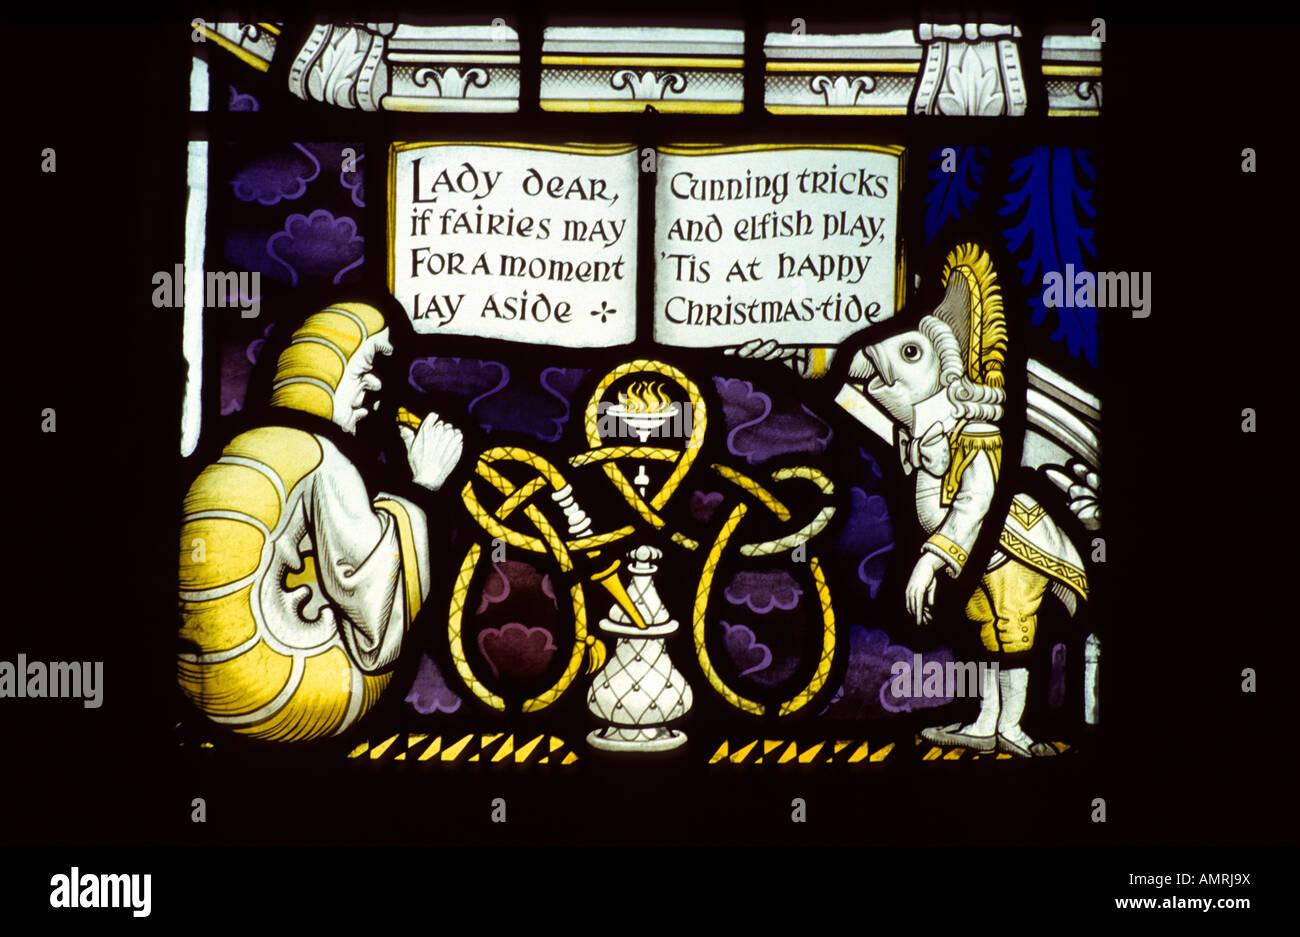 Lewis Carroll stained glass memorial window #2, Daresbury church, Cheshire, UK. - Stock Image